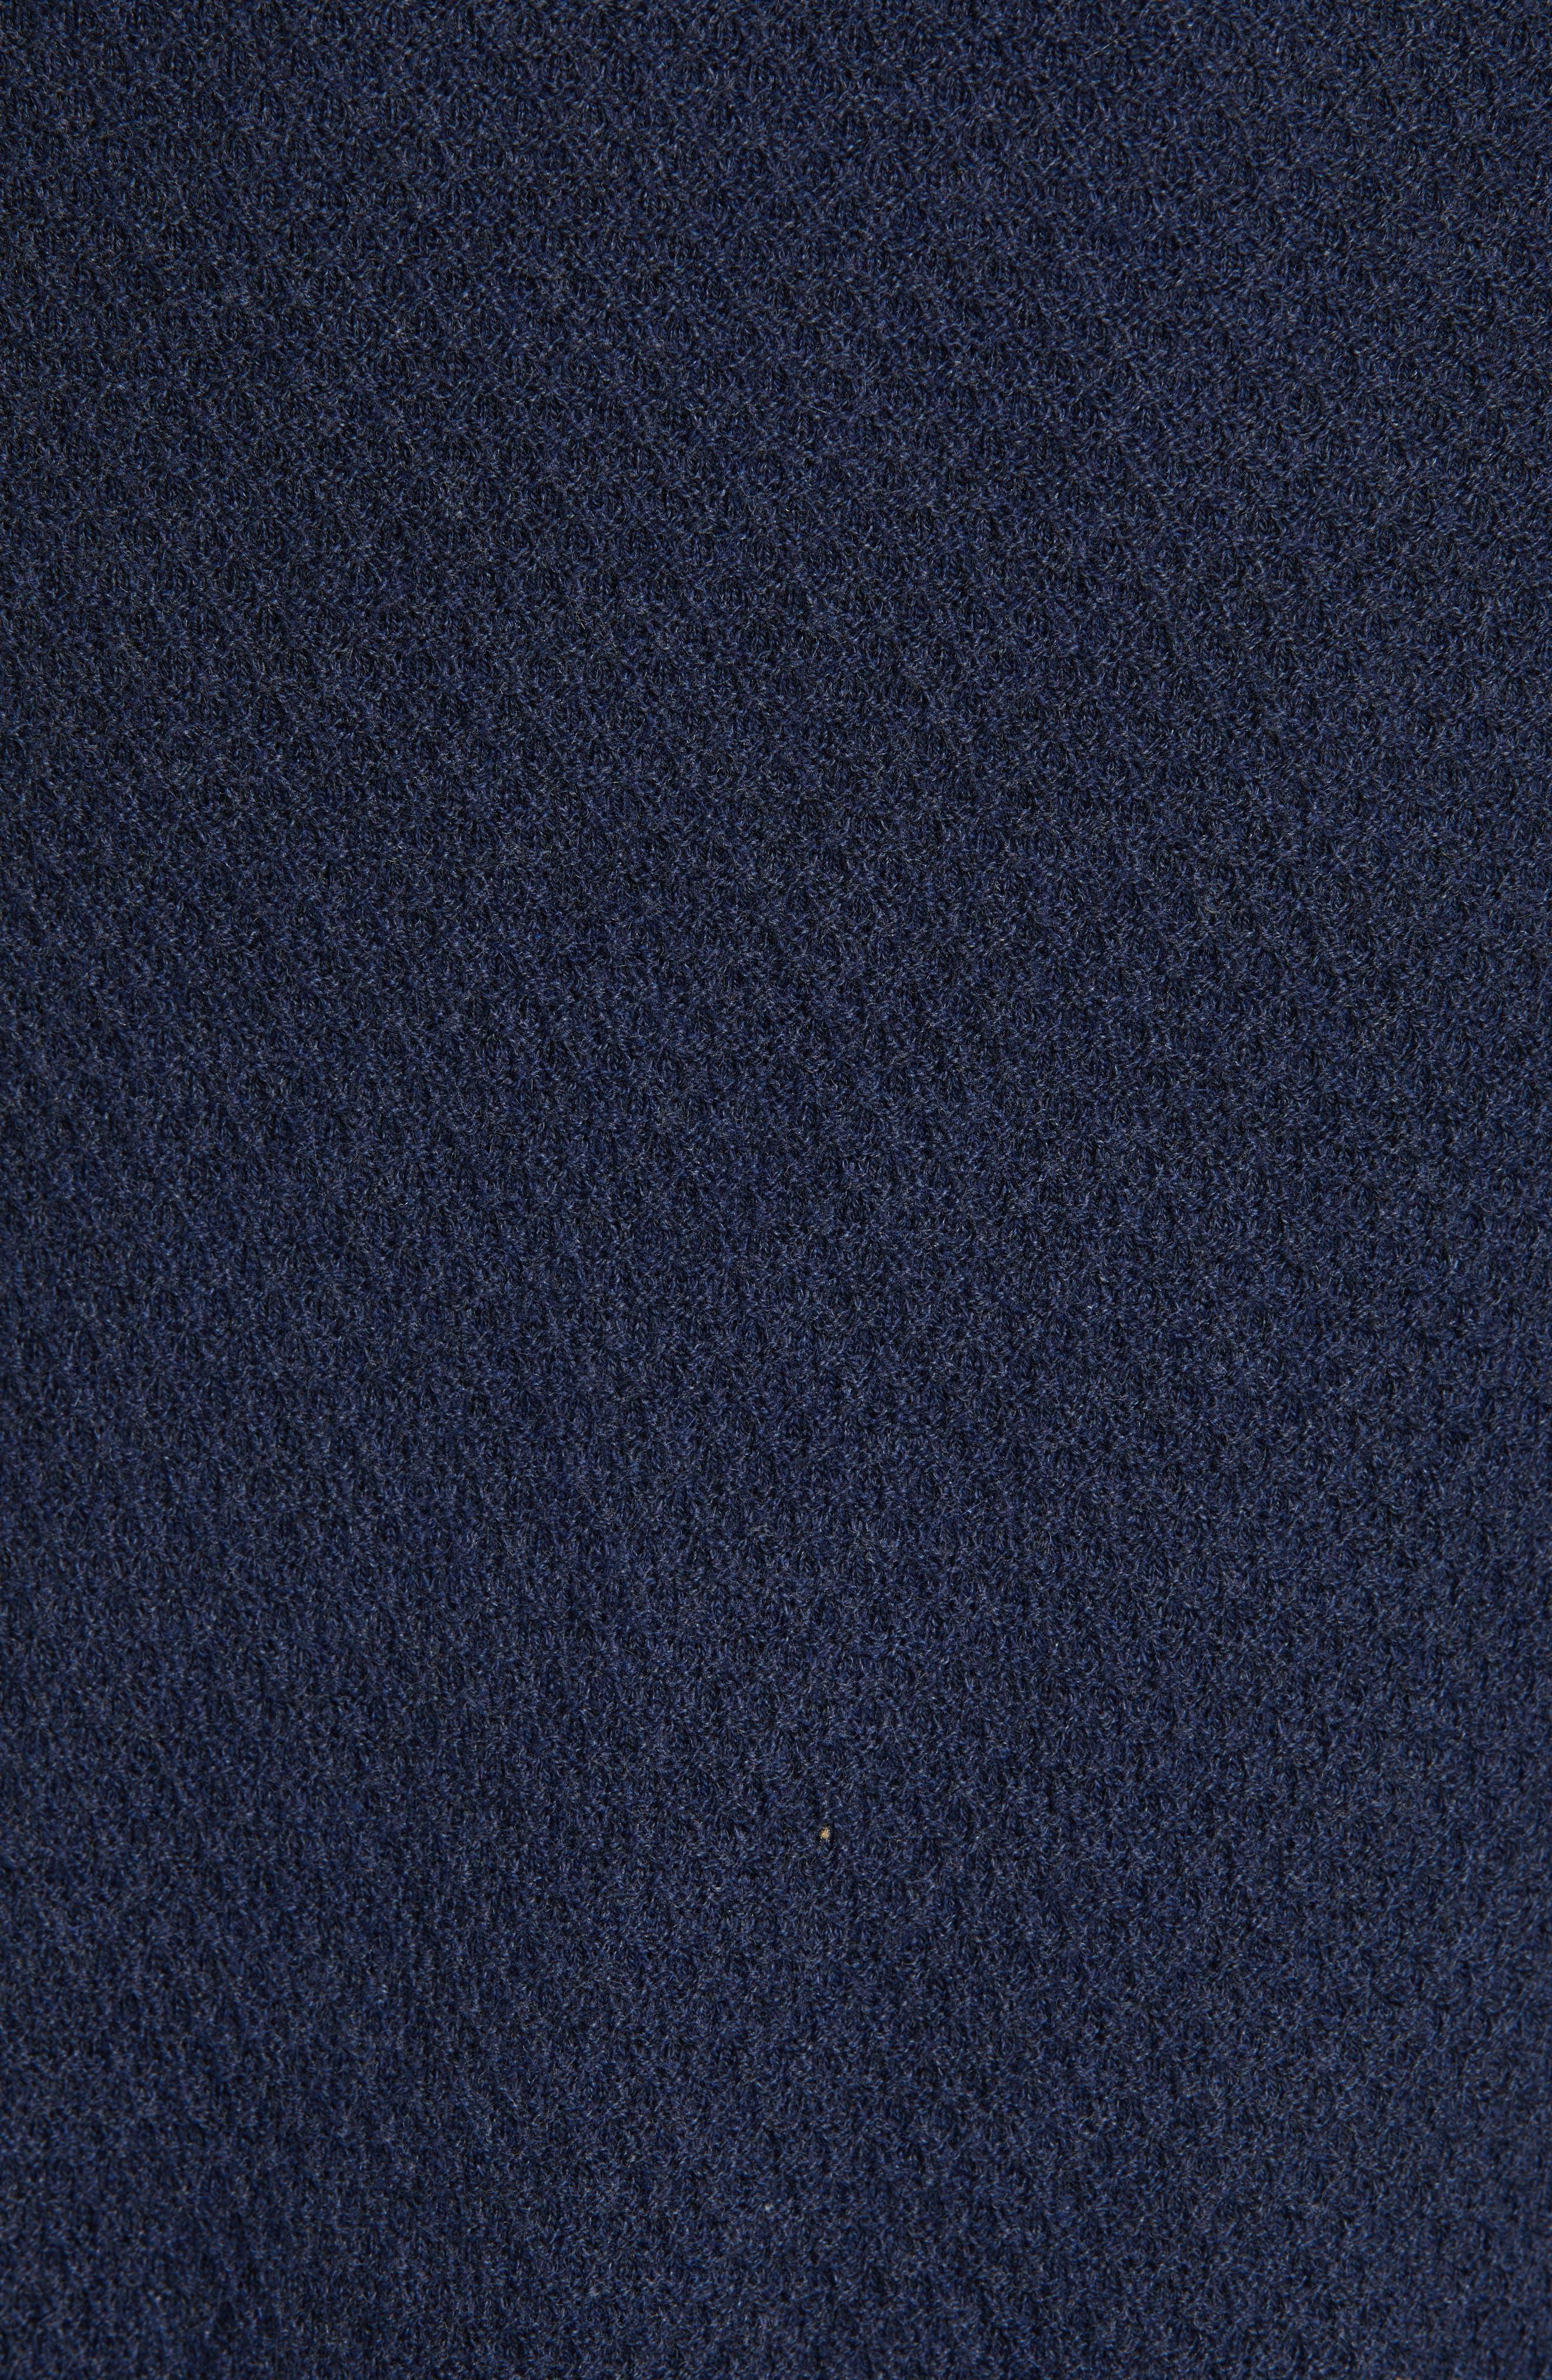 ZACHARY PRELL, Cedarhurst Hooded Zip Sweater, Alternate thumbnail 6, color, NAVY